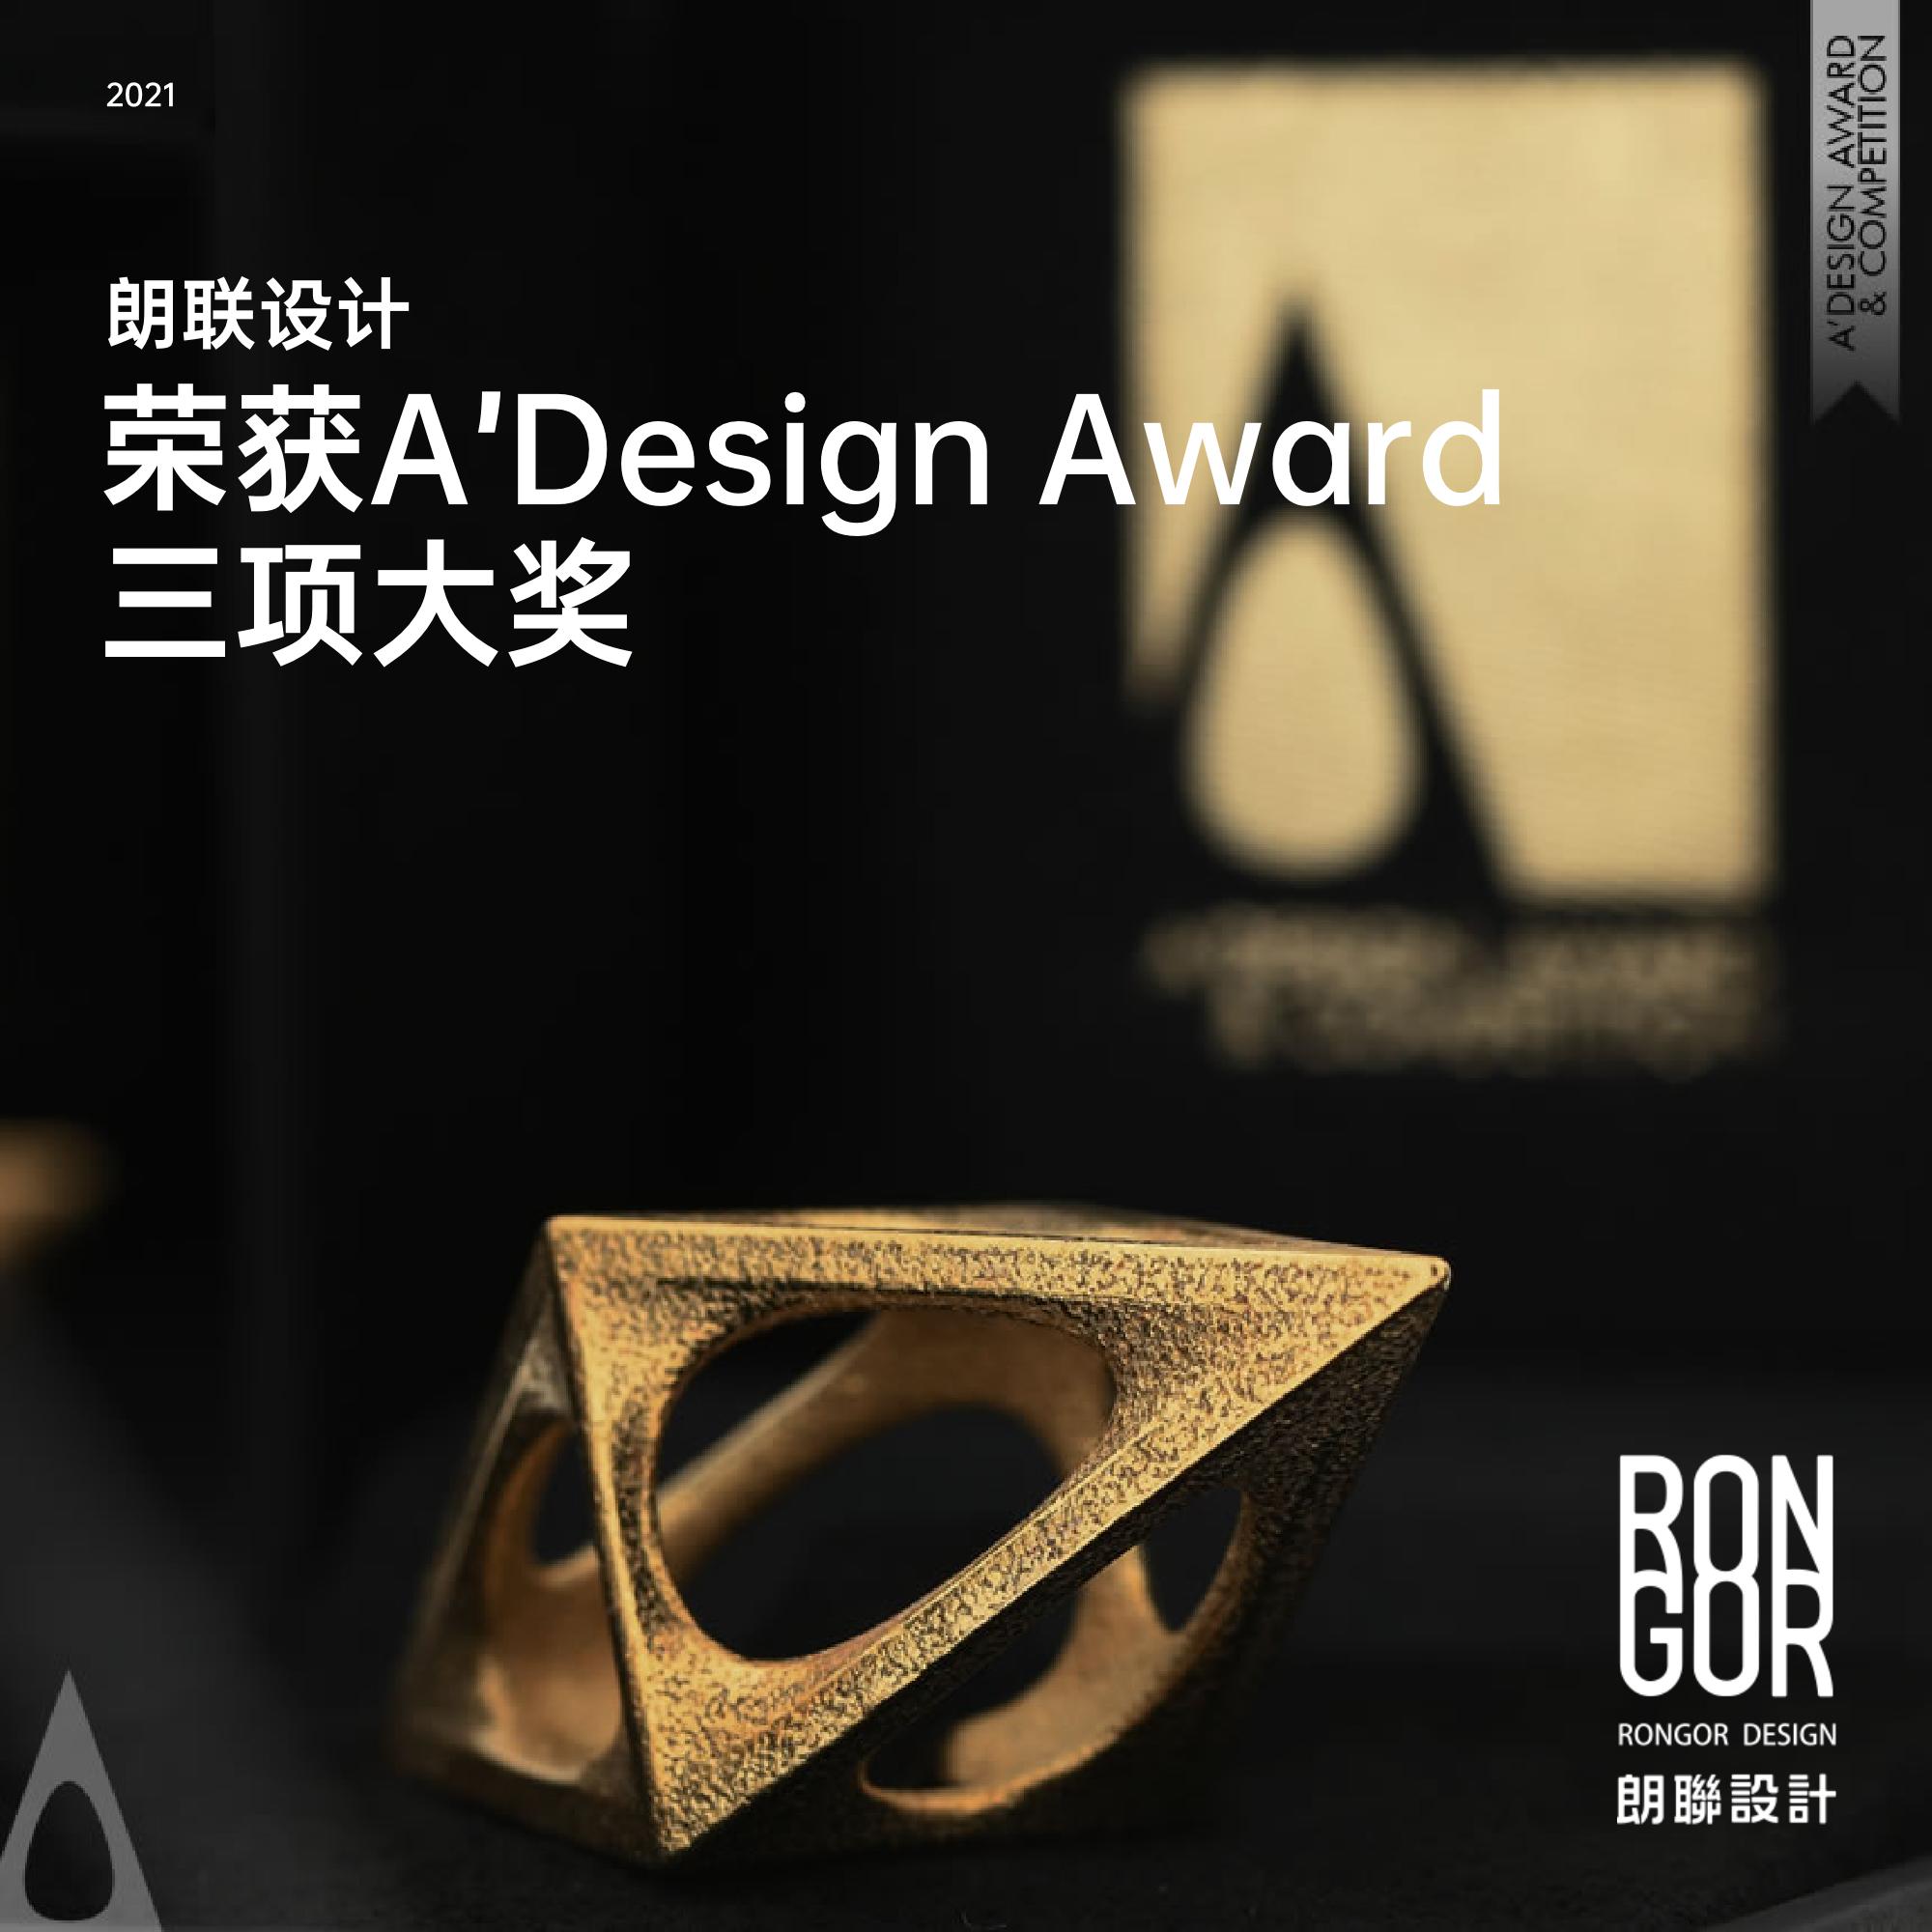 "RONGOR资讯 | 朗联设计再次斩获""欧洲设计界奥斯卡""A'DESIGN AWARD三项大奖"